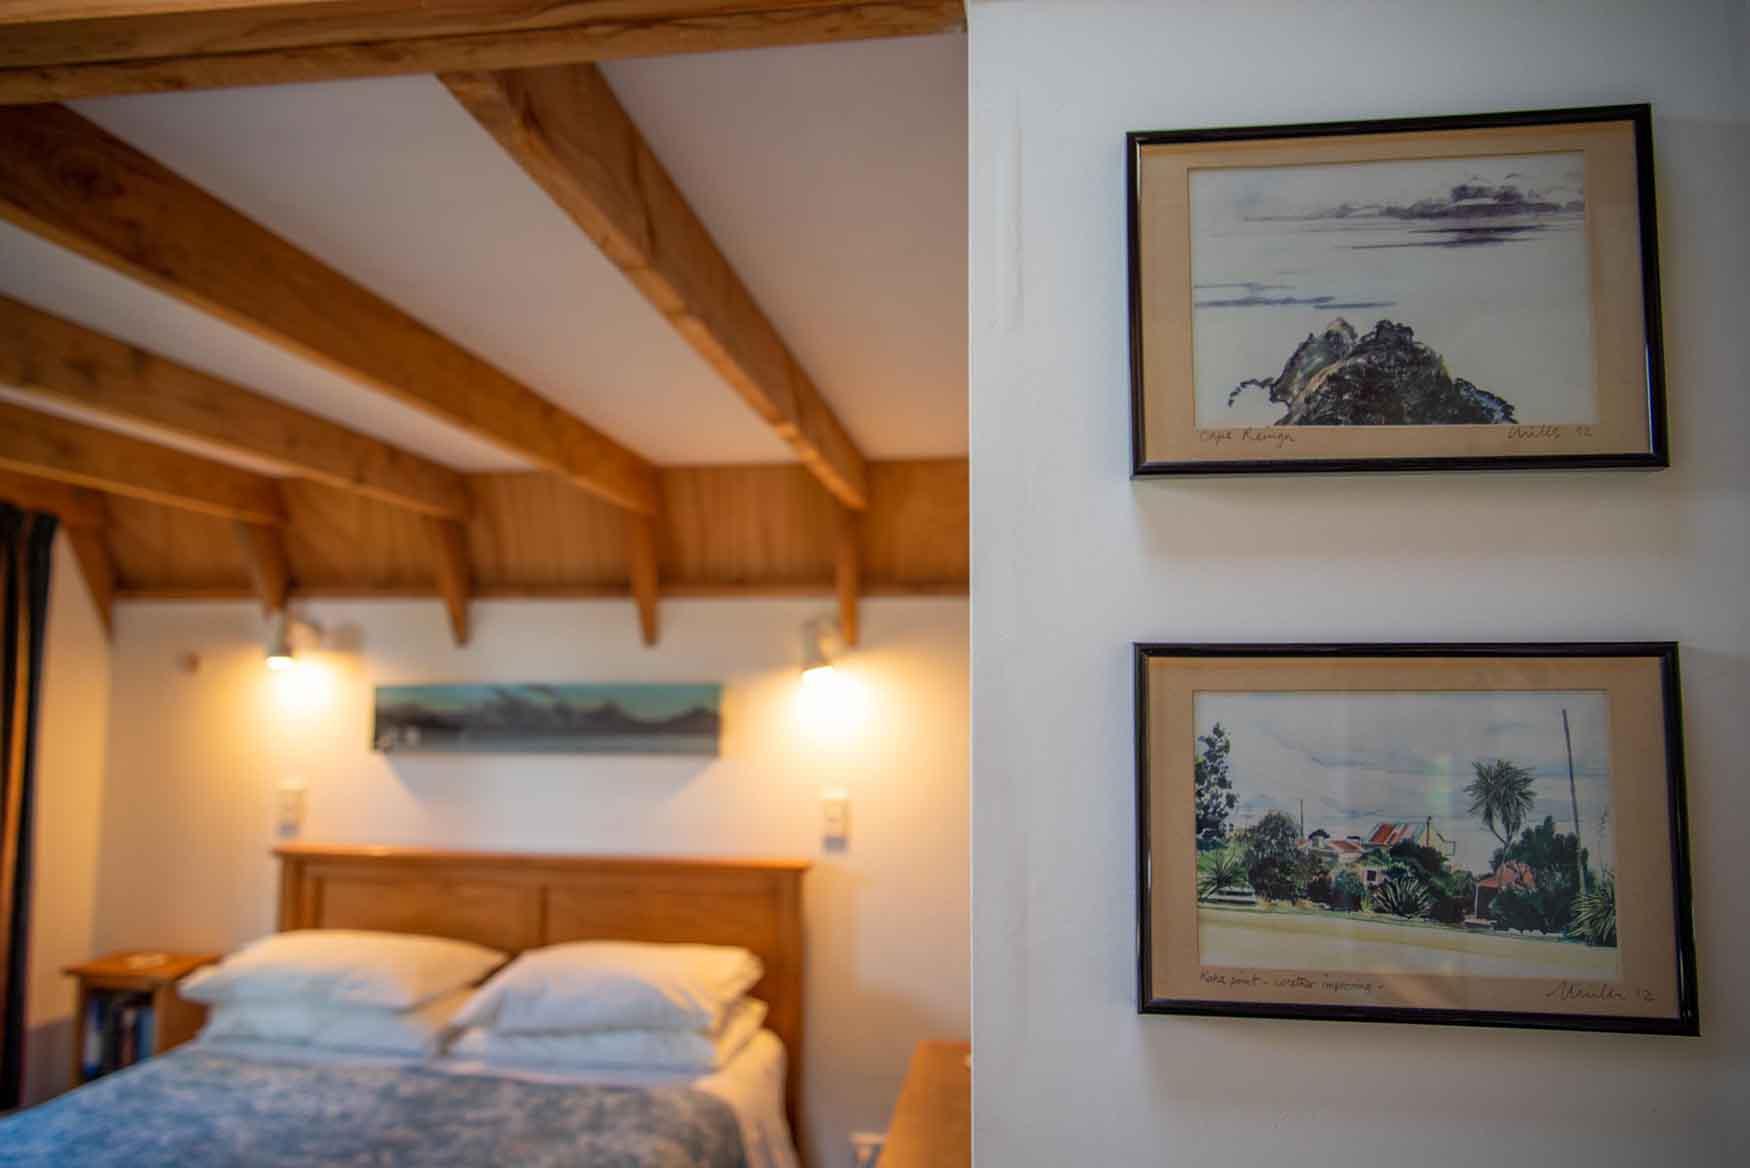 Artwork in Fantail cottage accommodation in Dunedin